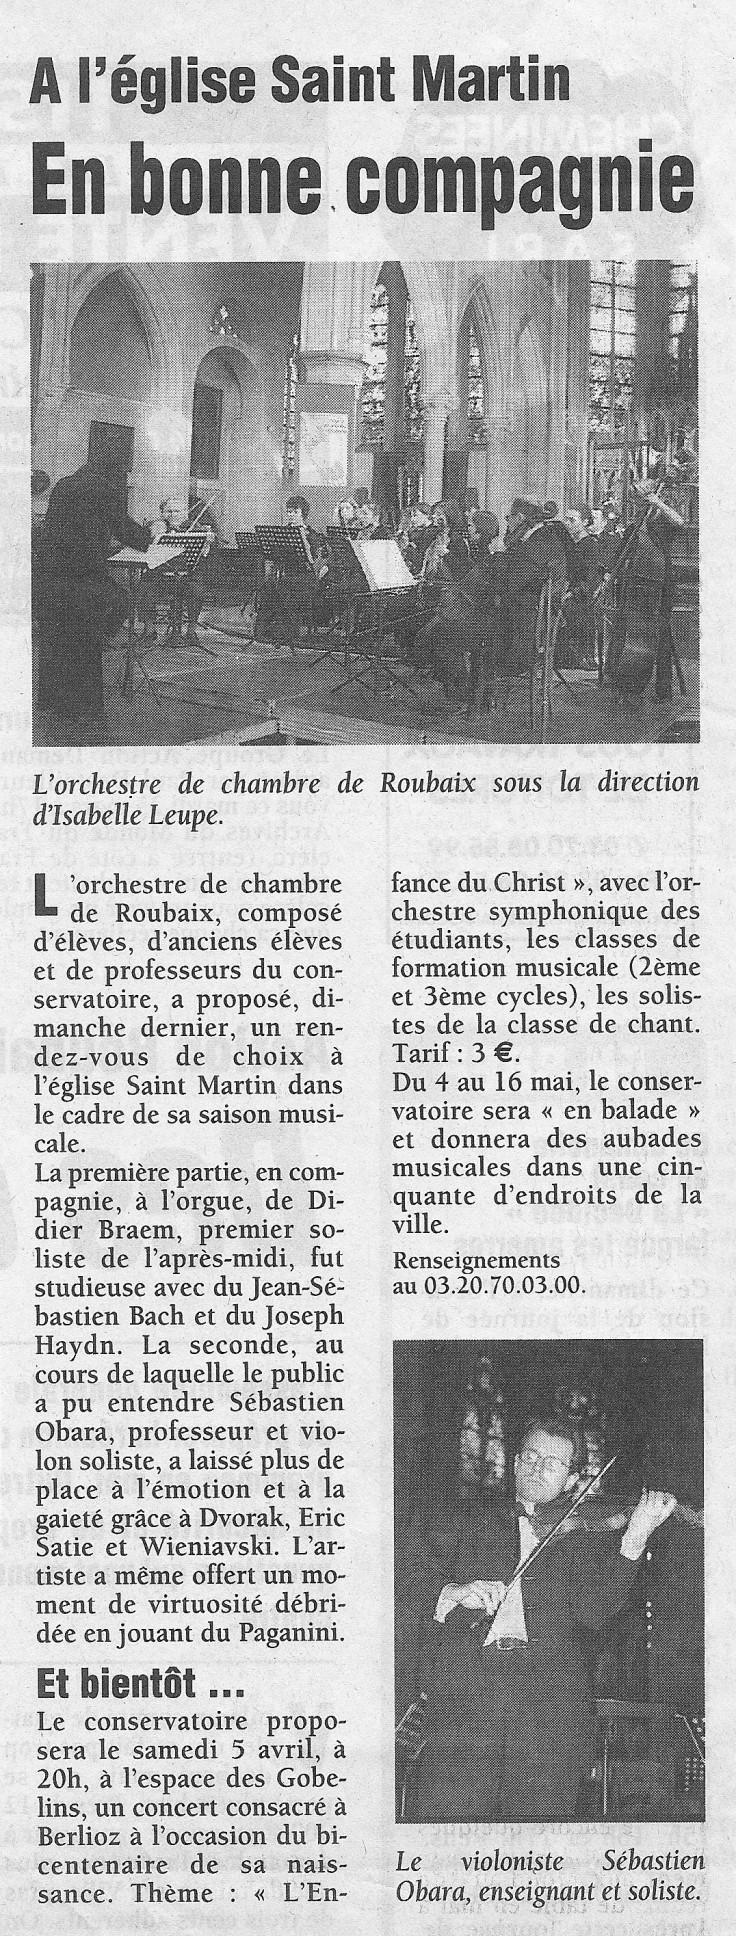 wieniawski-polonaise-roubaix-article-001